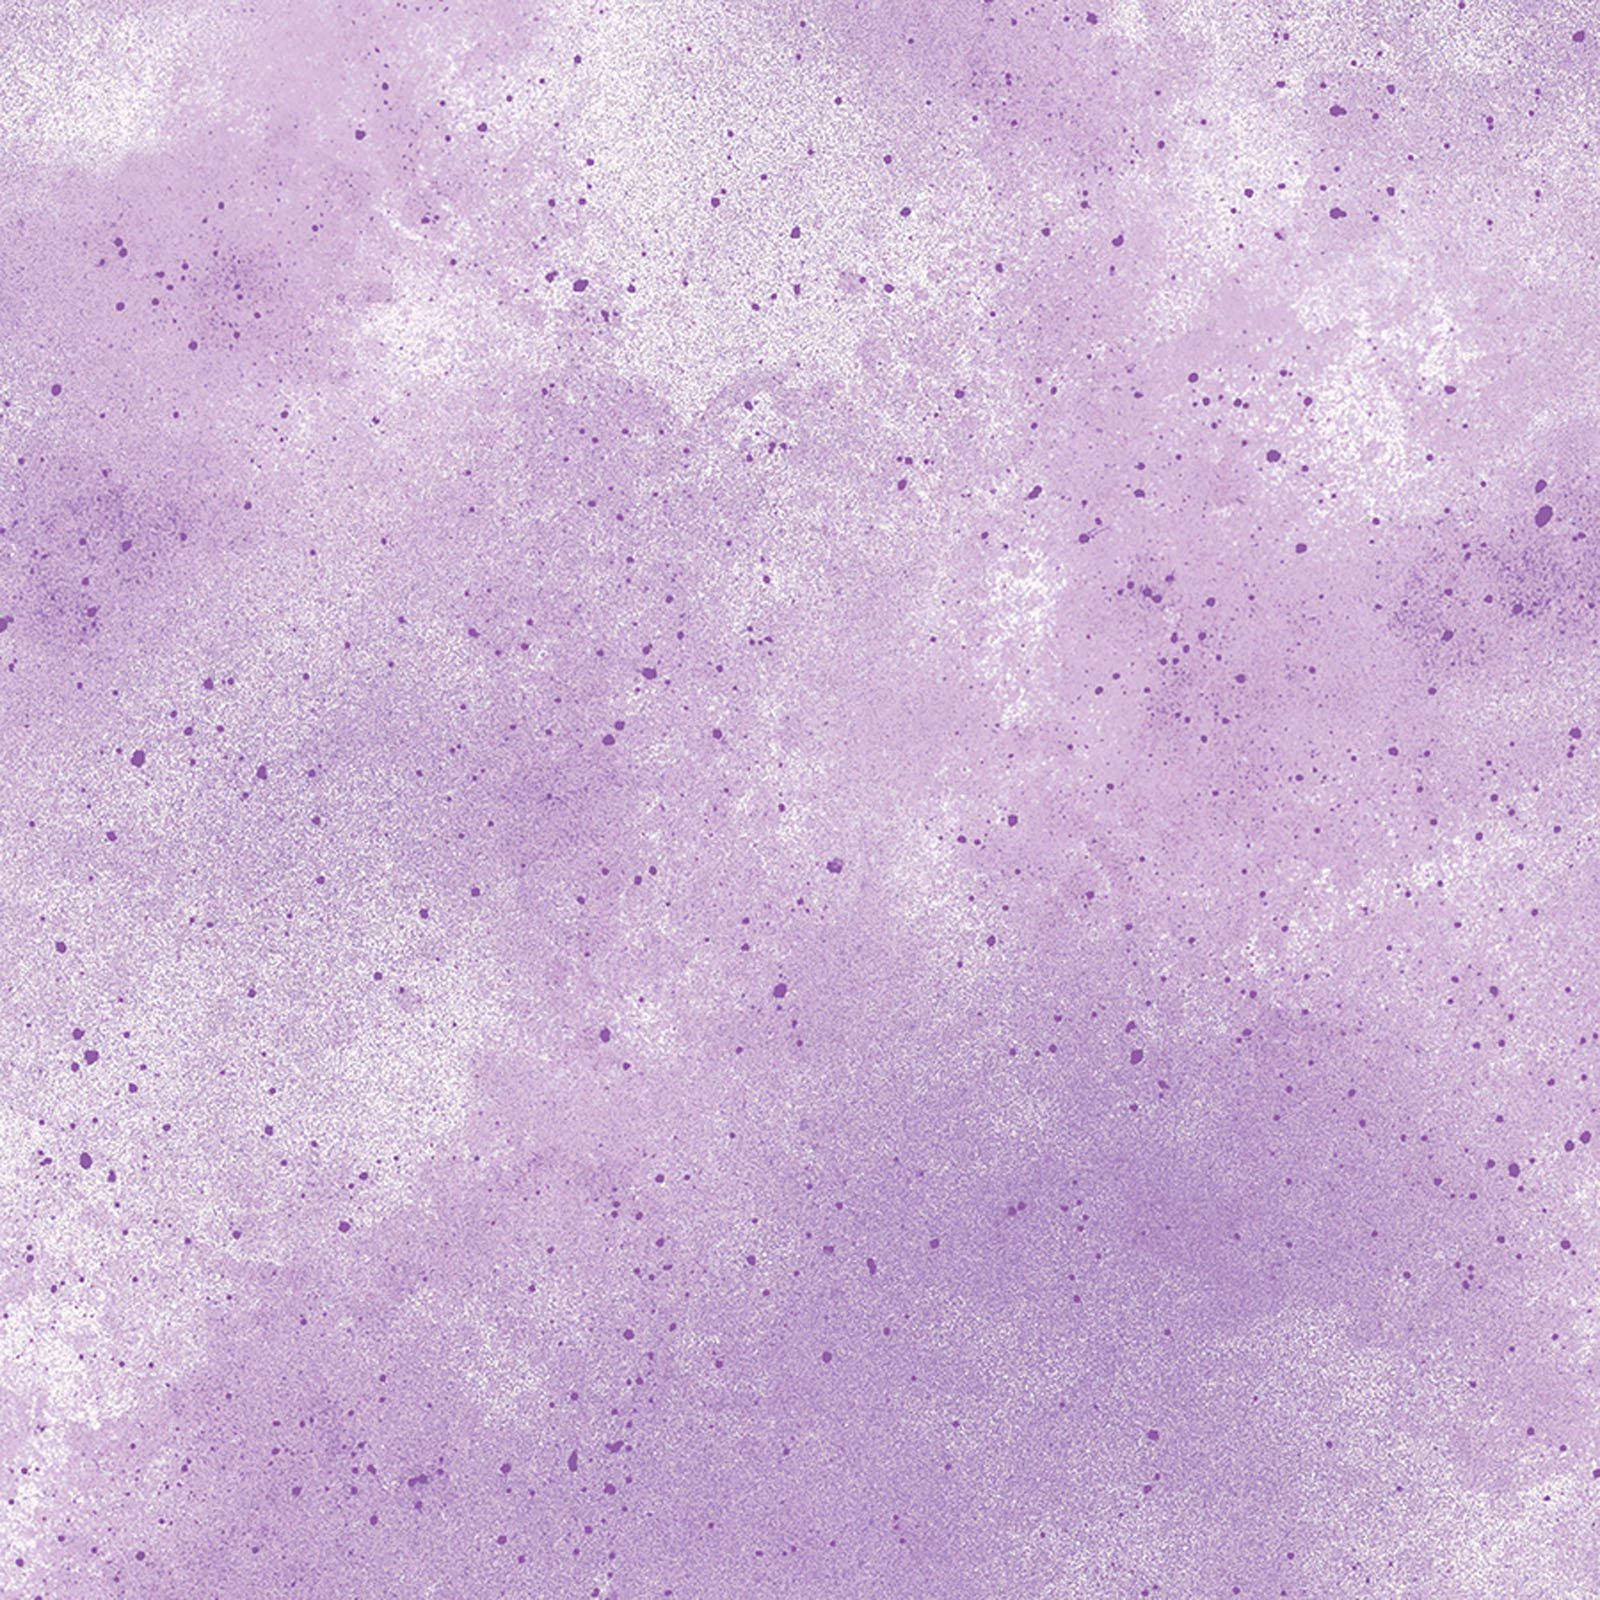 New Hue - Lilac<br/>Kanvas Studio 8673-06